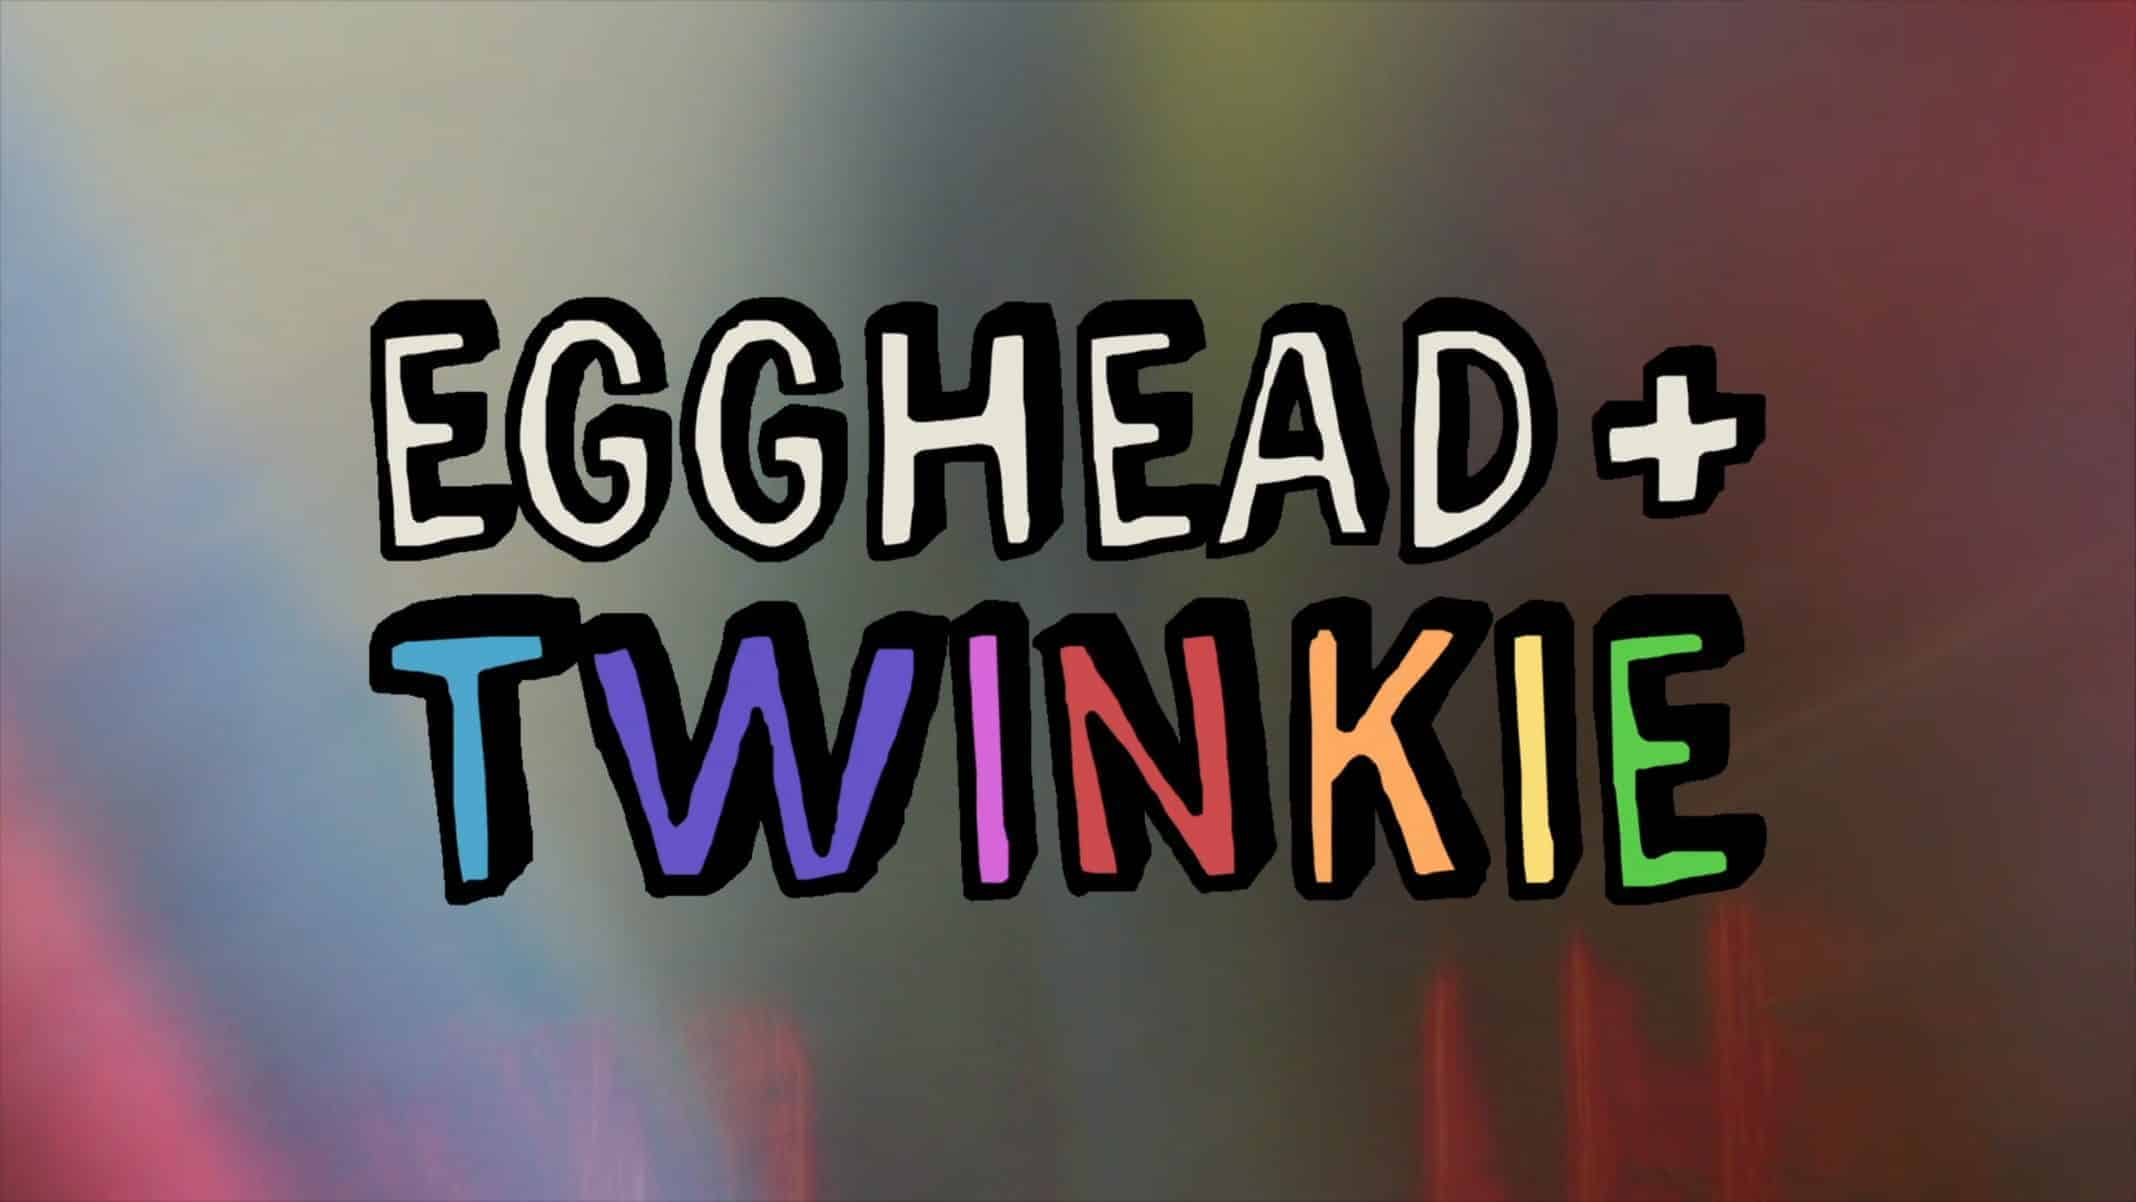 Title Card - Egghead & Twinkie